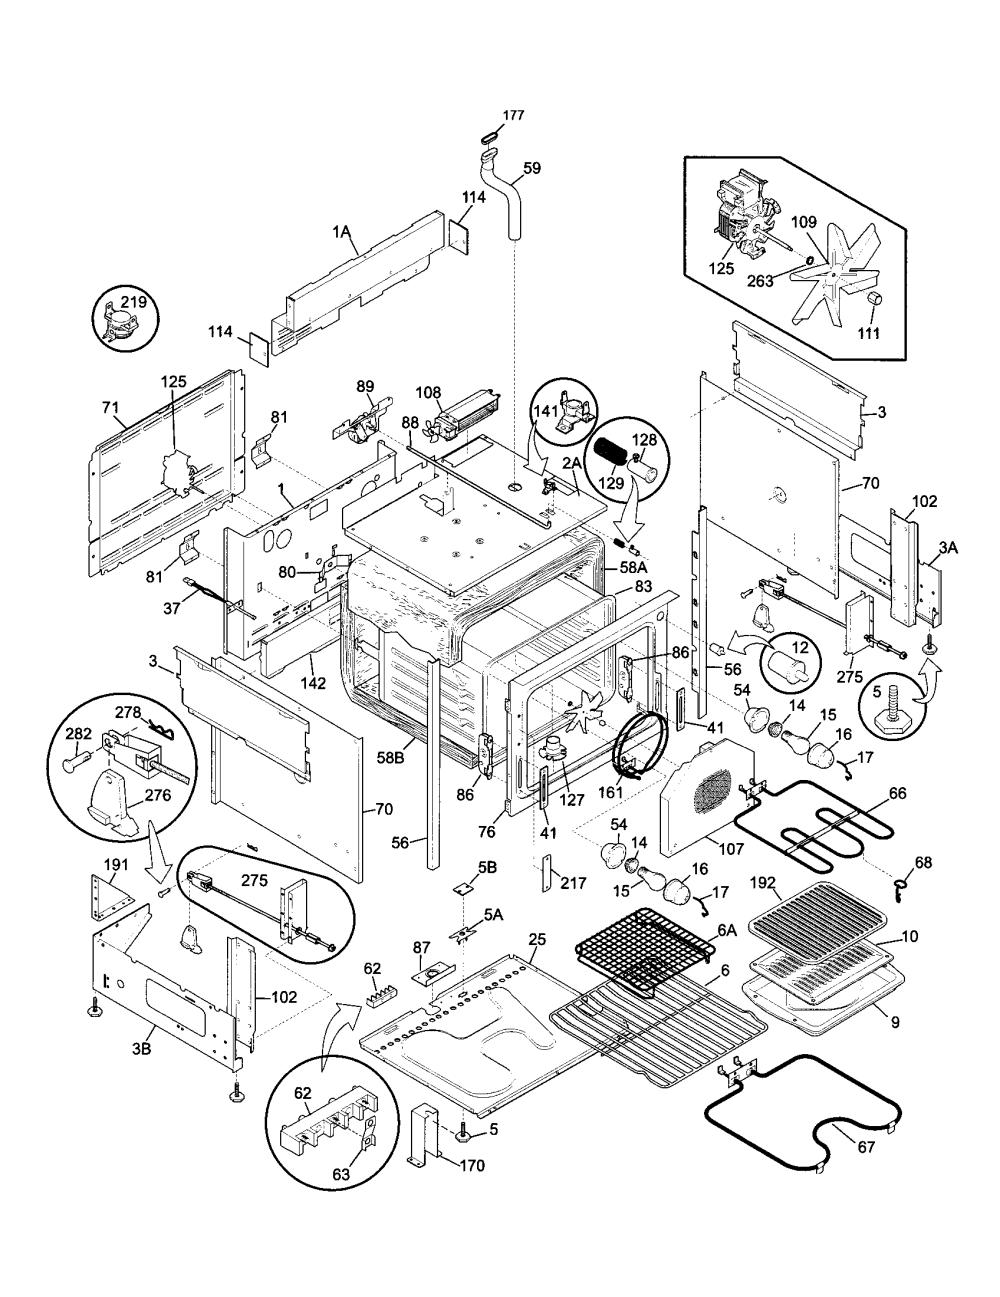 medium resolution of 79046802992 elite electric slide in range body parts diagram kenmore 79046802992